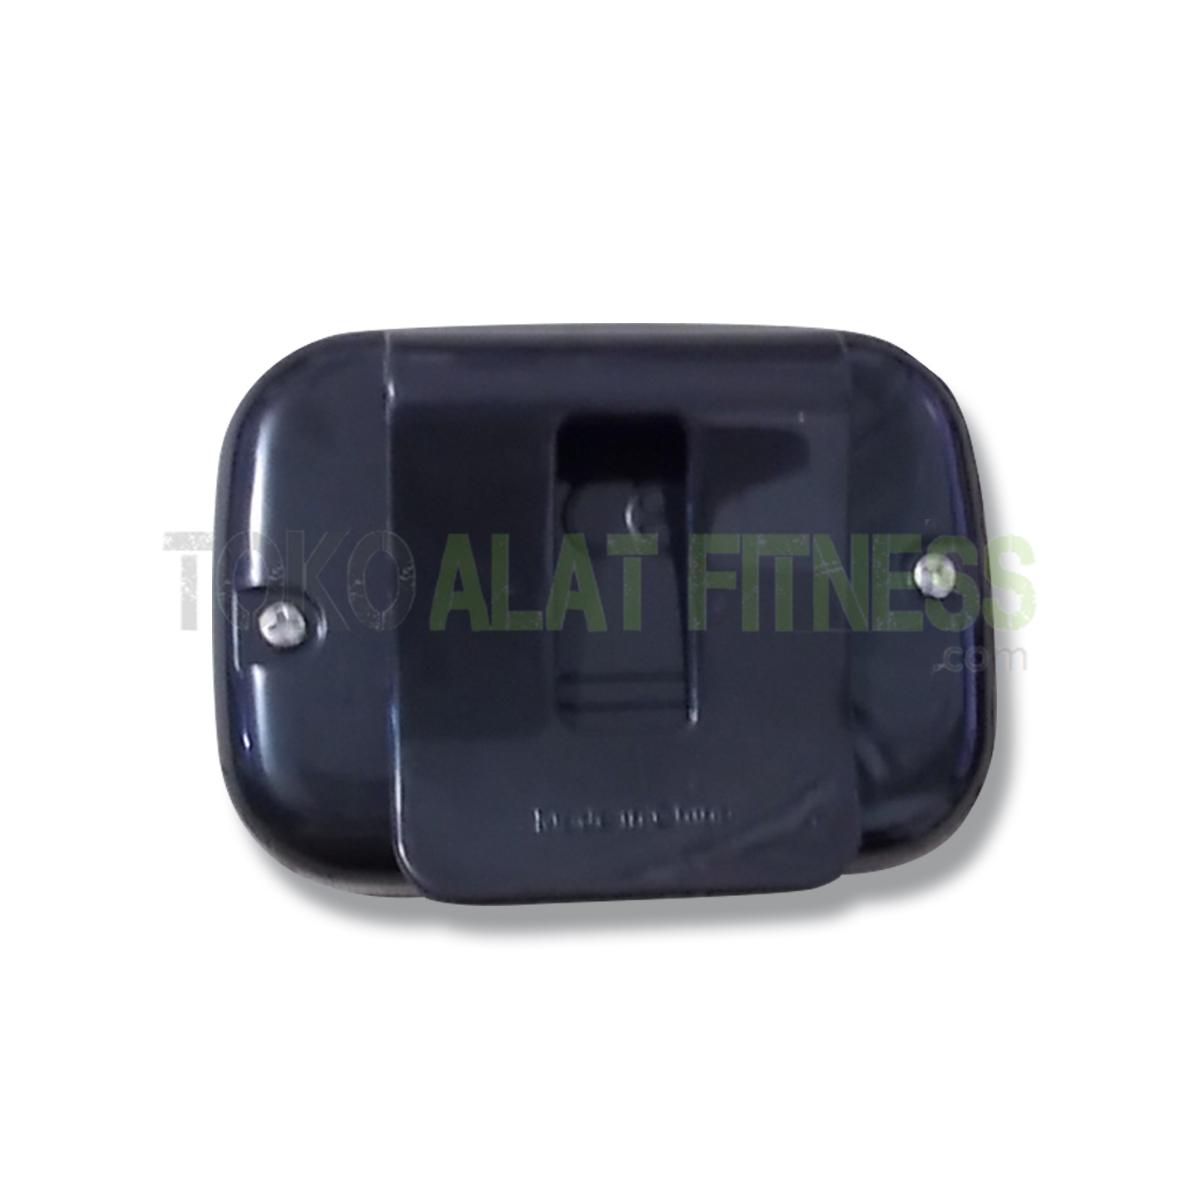 2 wtm - Mini Pedometer With Two Keys, Black Body Gym